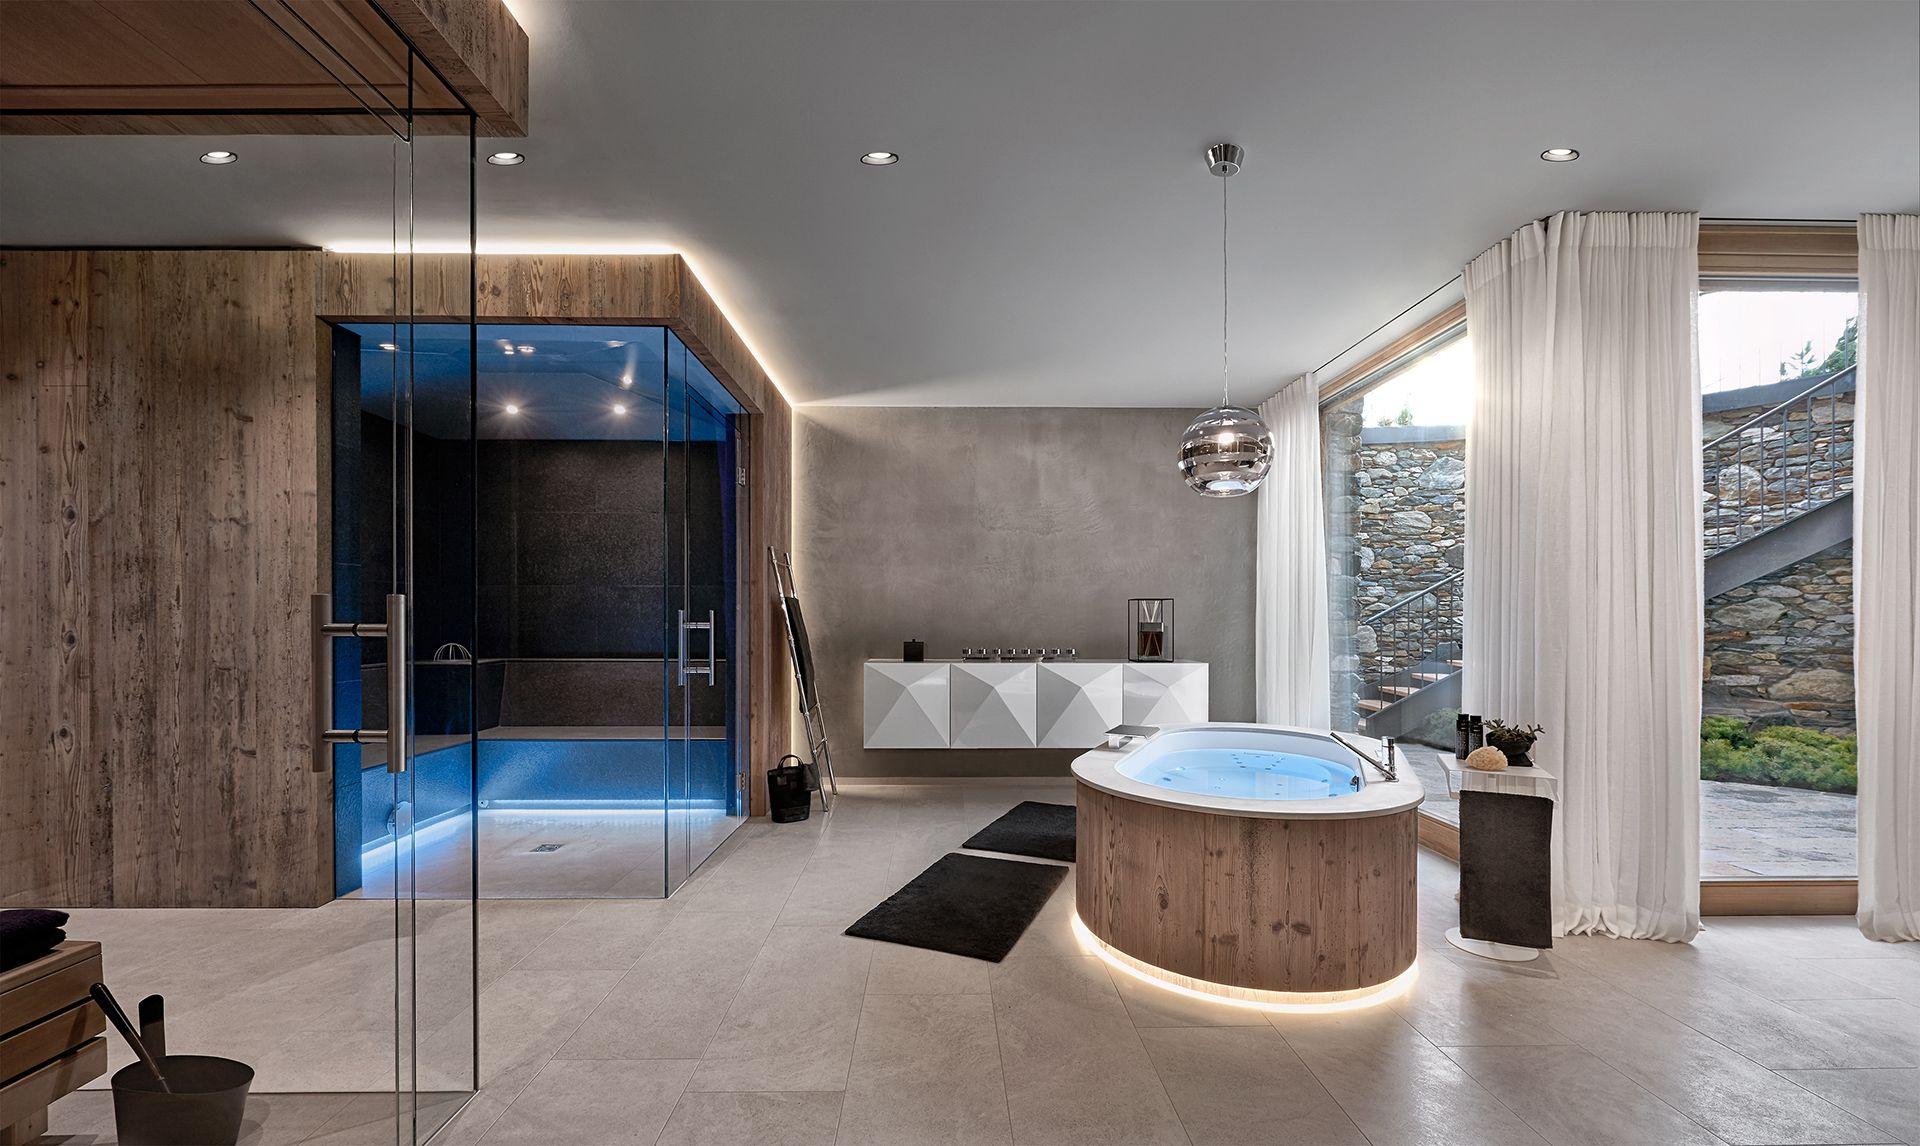 Gasteiger Bad Kitzbuhel Exklusive Einblicke Modernes Badezimmerdesign Luxus Badezimmer Kurmittelhaus